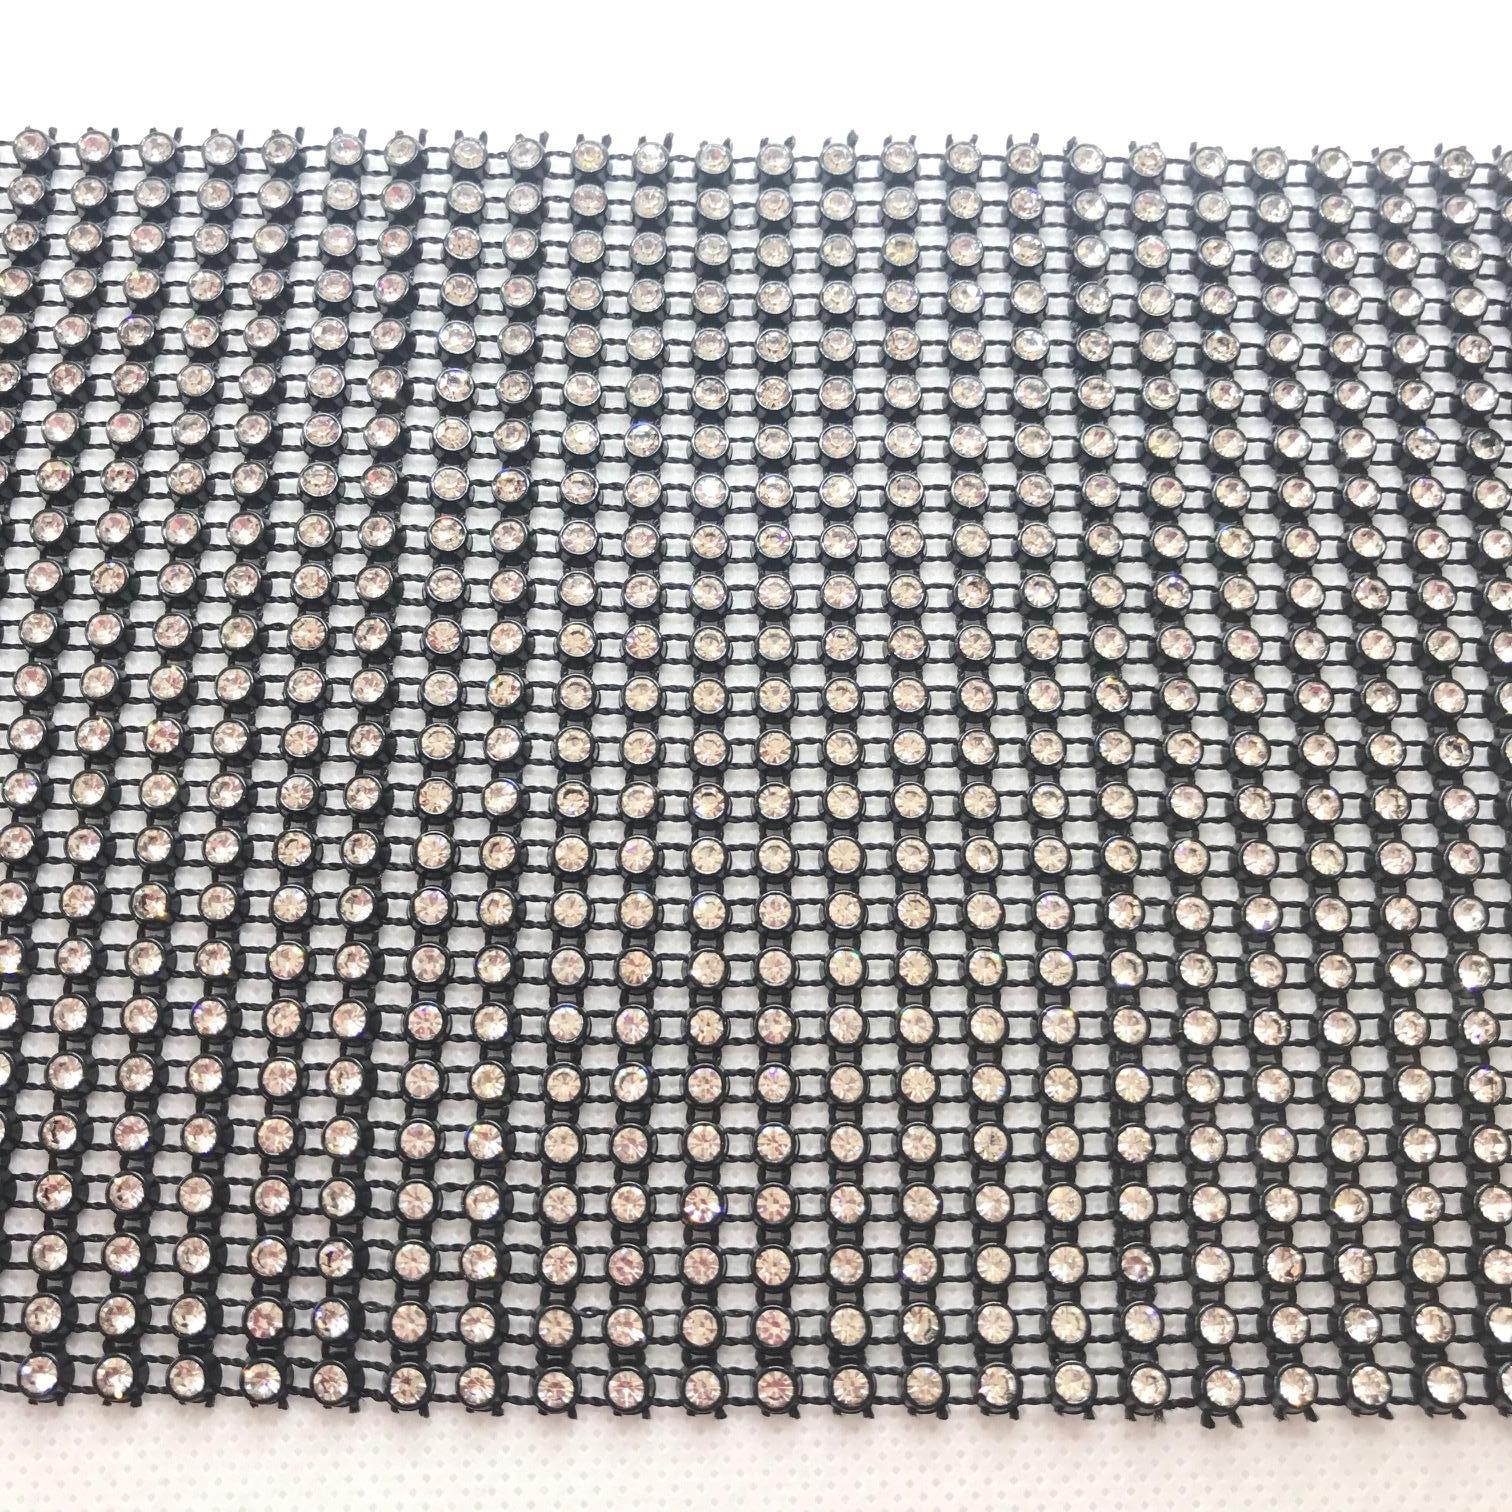 Bande de strass a coudre 3mm noir strass cristal 24 rangs